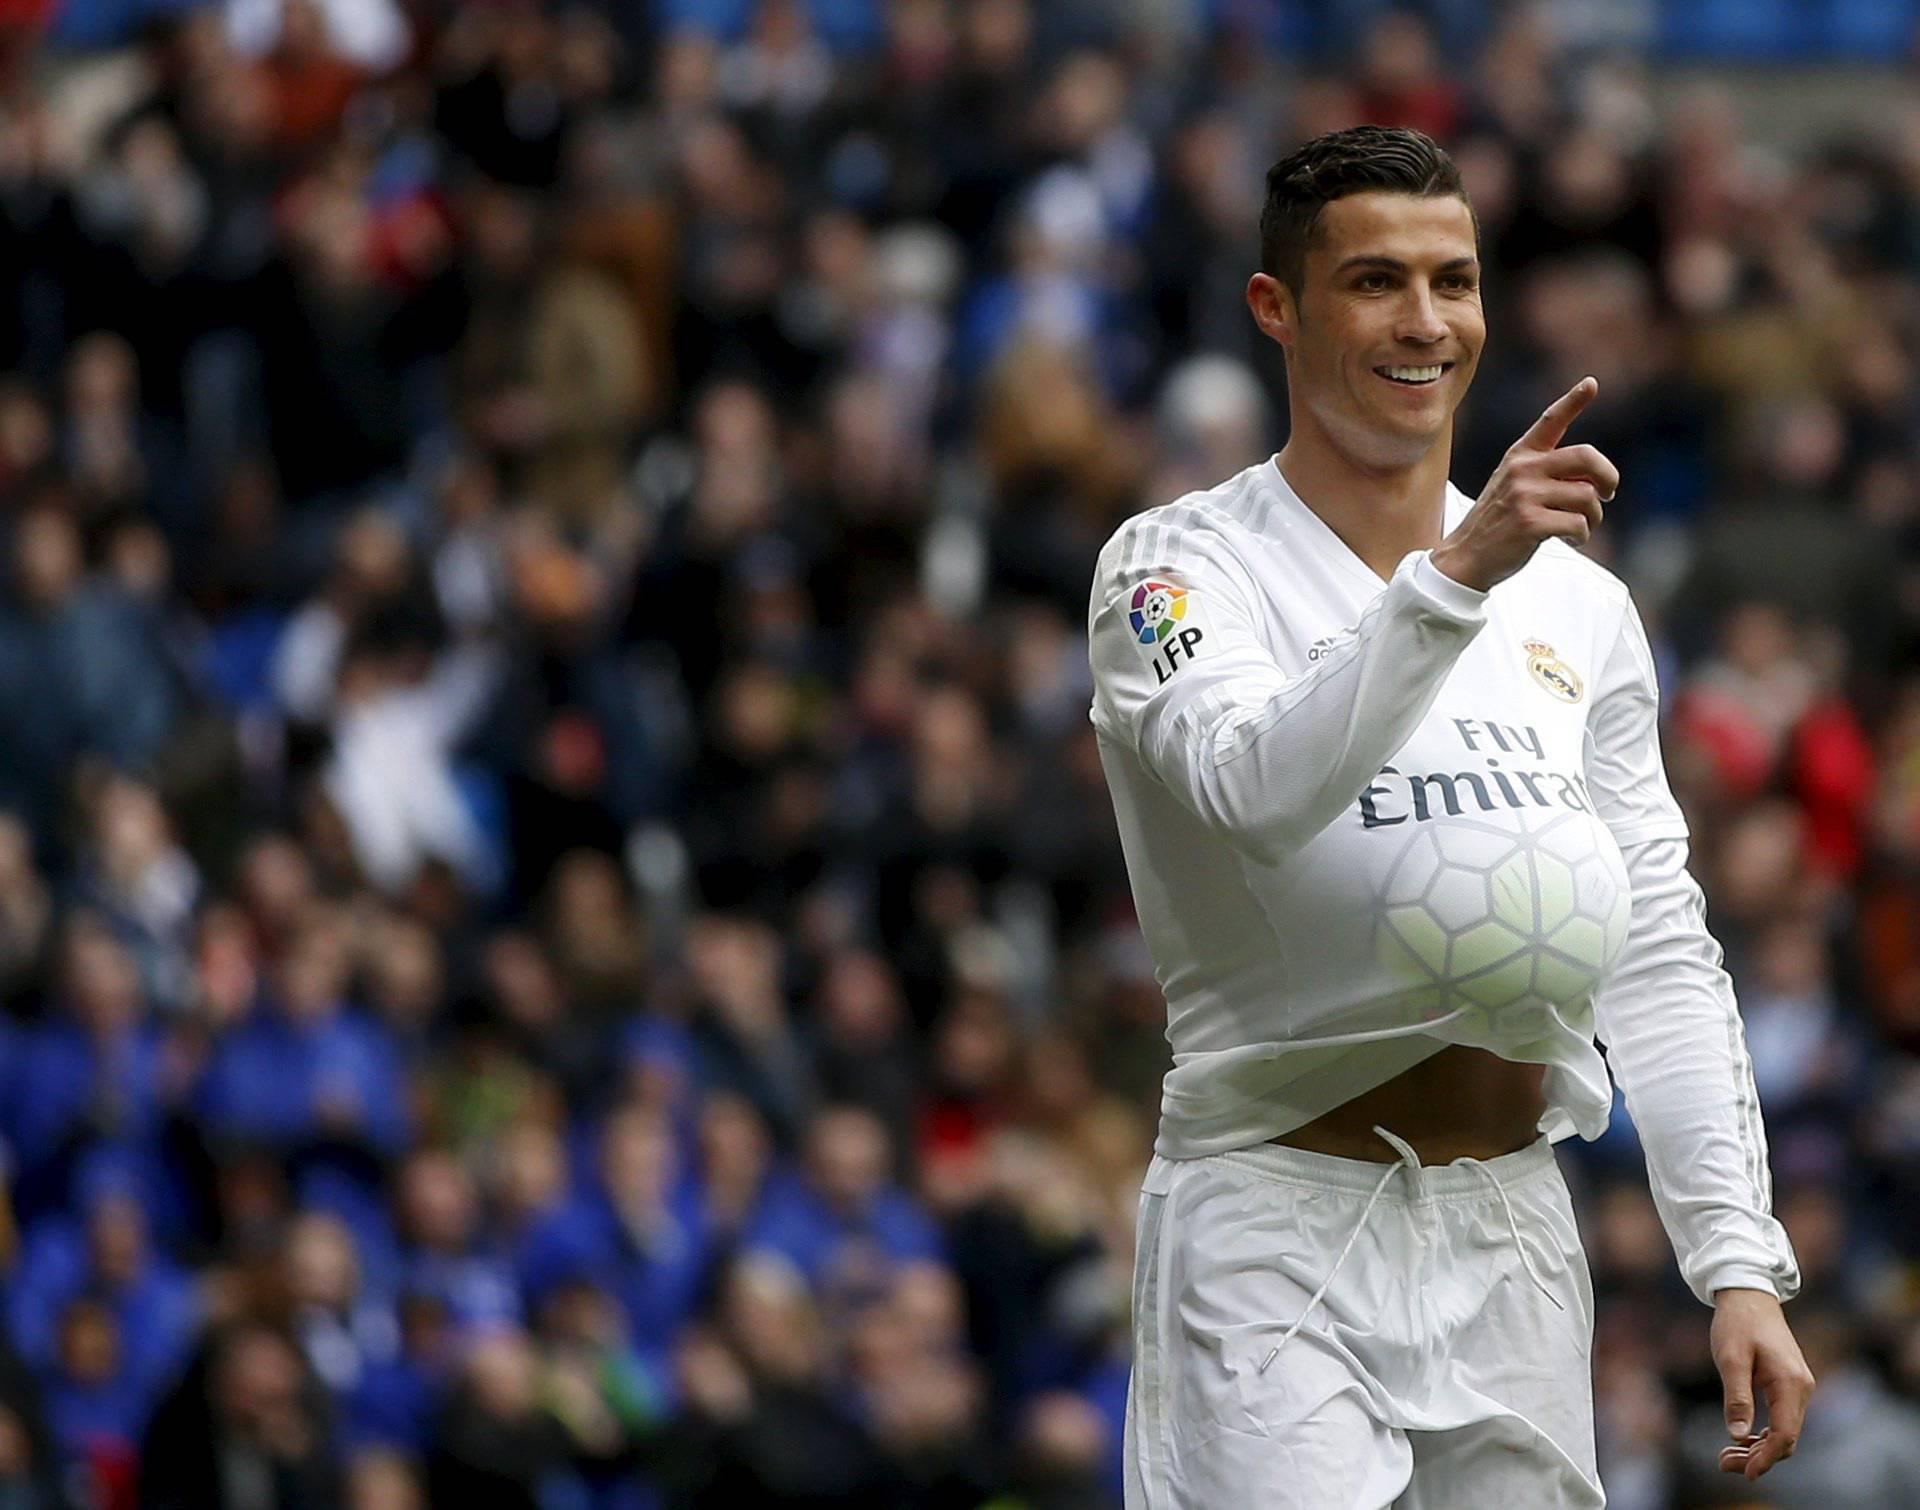 Ronaldo do mirovine u Realu: Potpisuje novi ugovor do 2021.